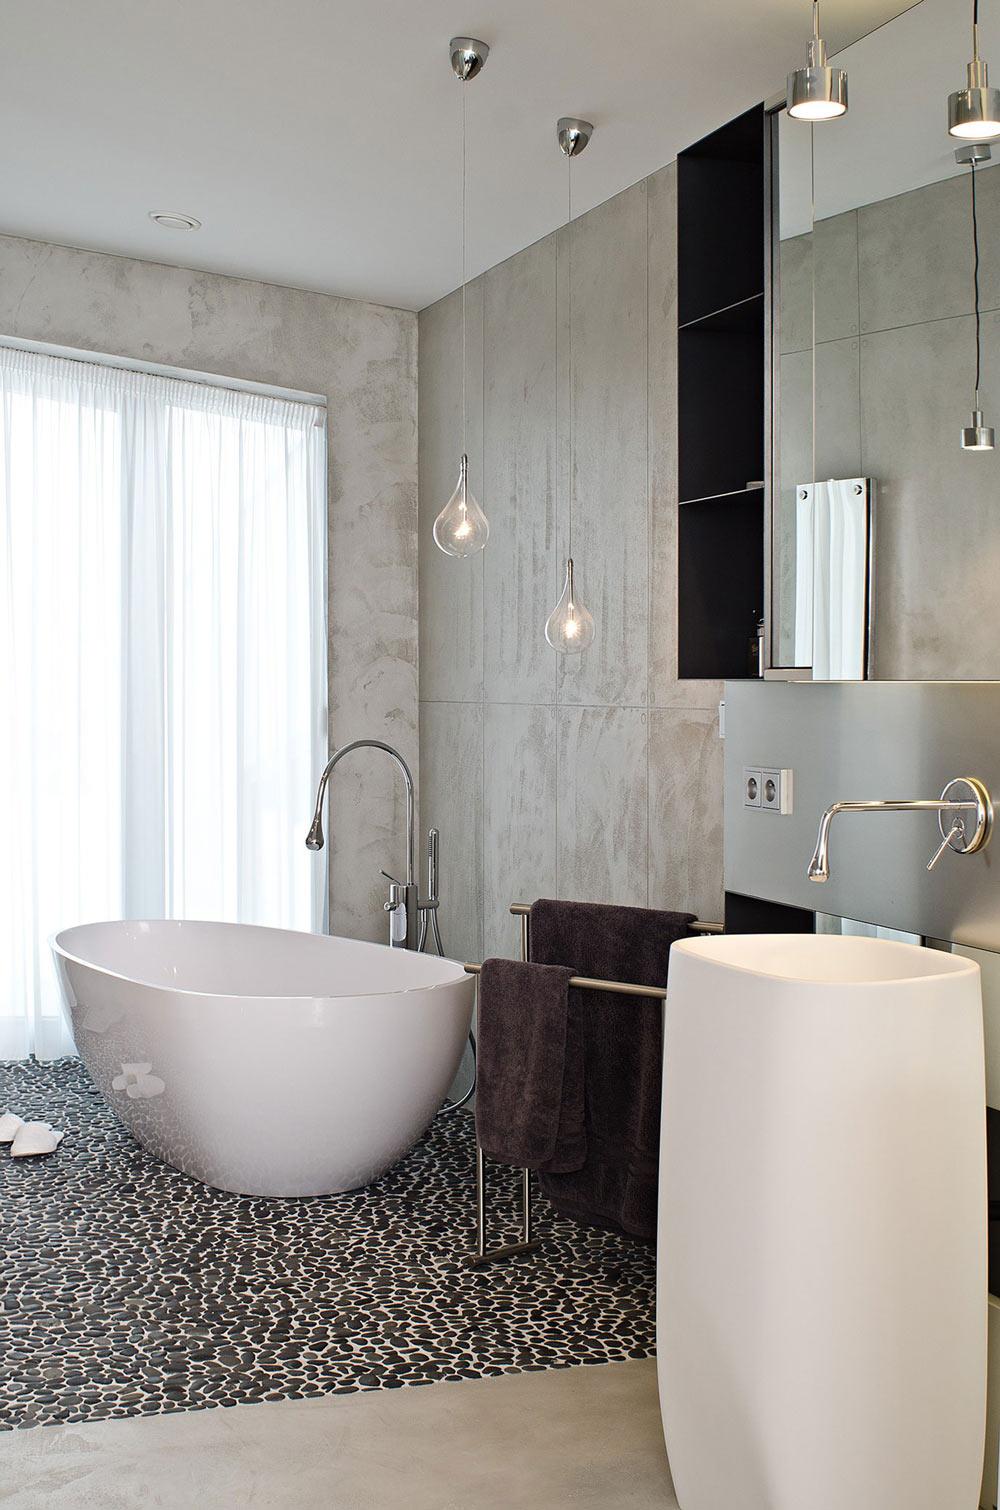 Bathroom, Concrete Interior Design in Osice, Czech Republic